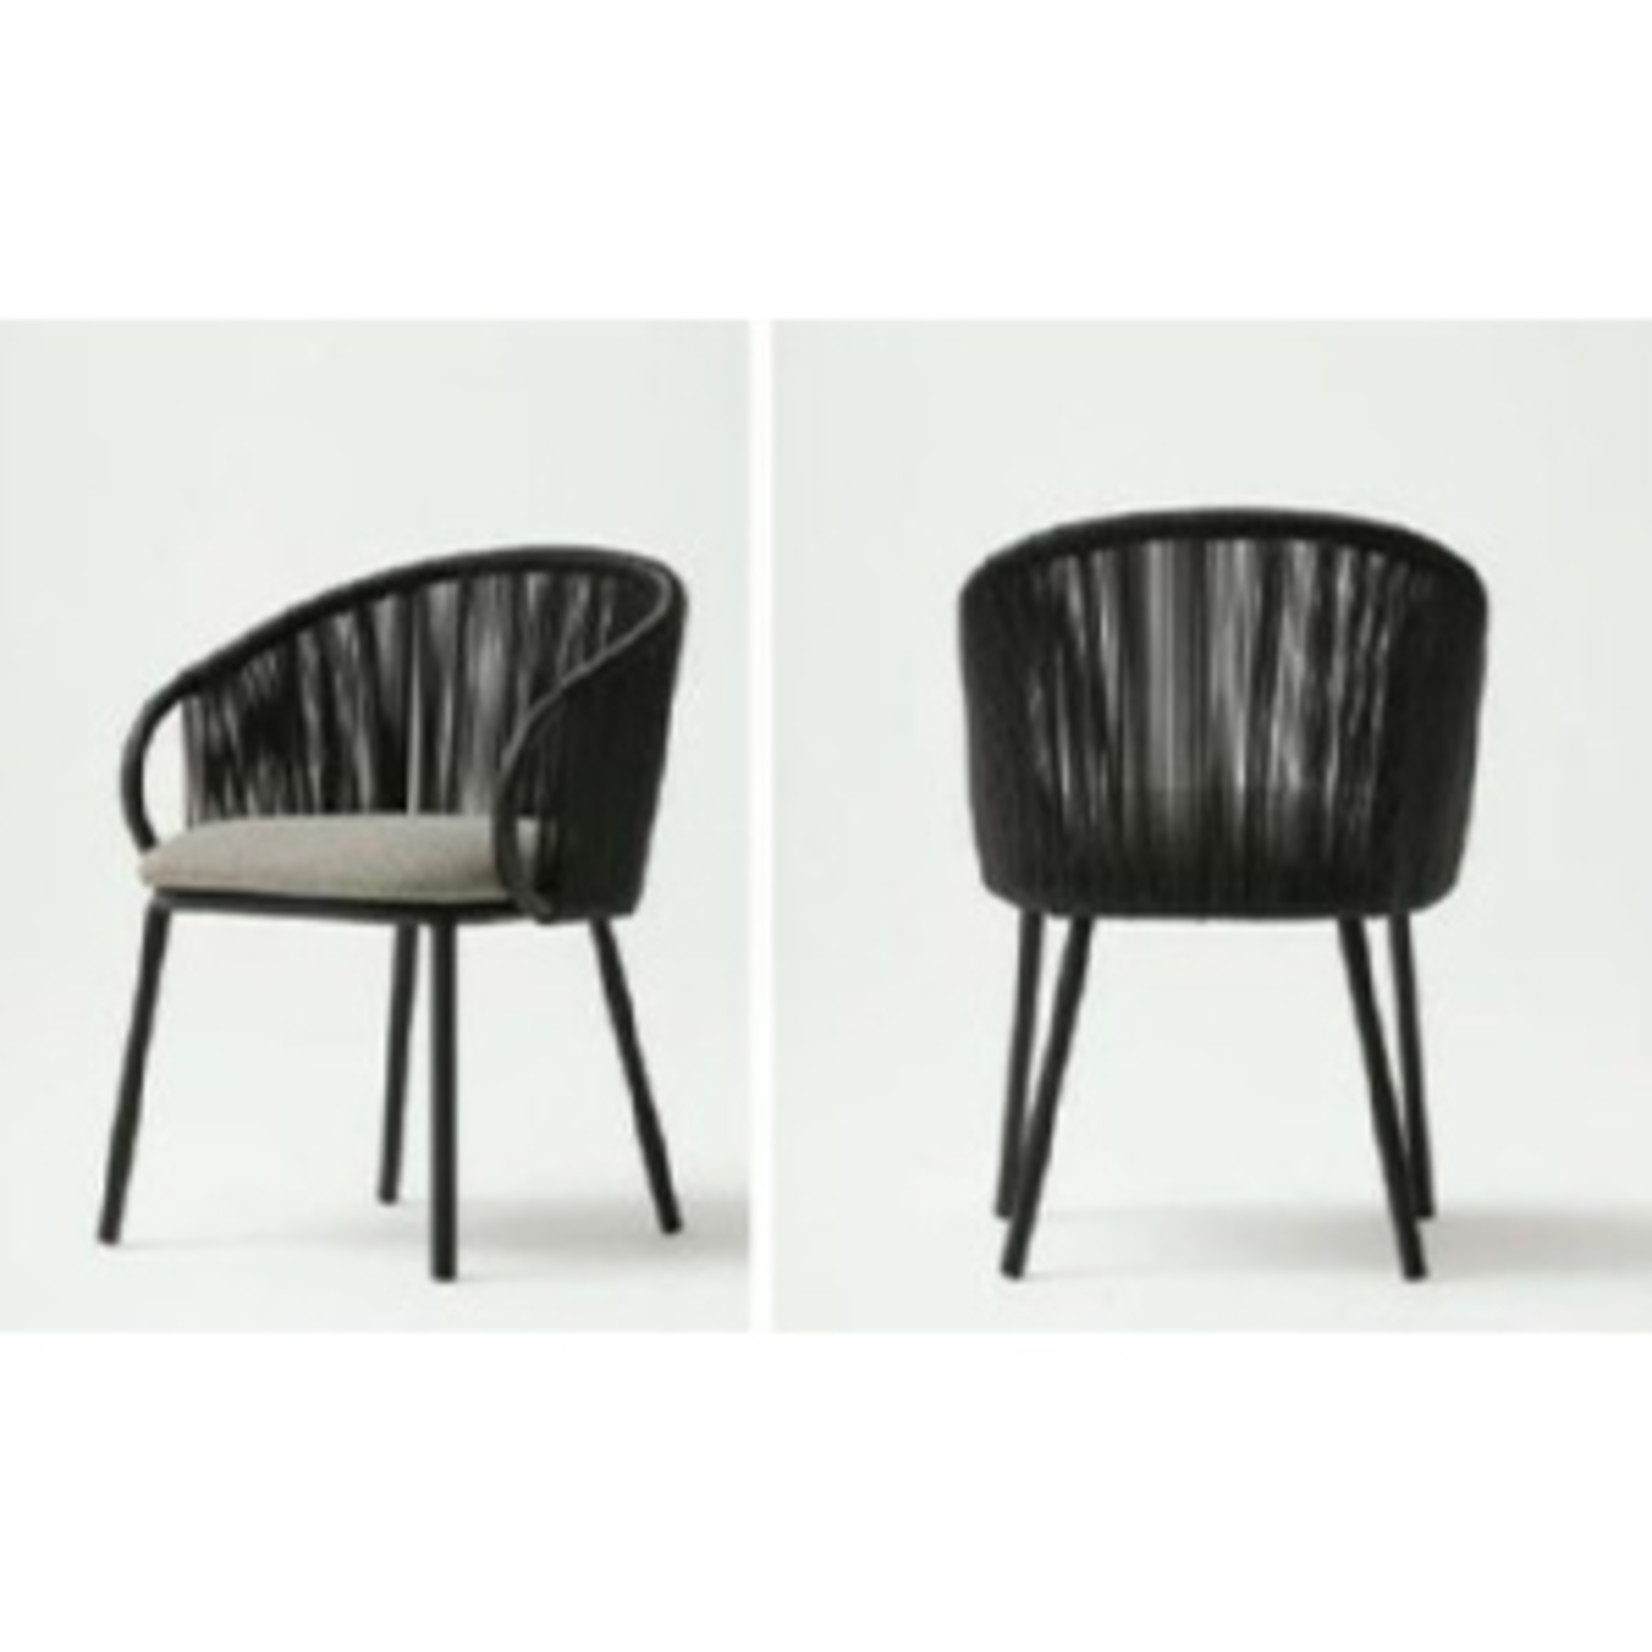 Harmony Studio Suri Chair